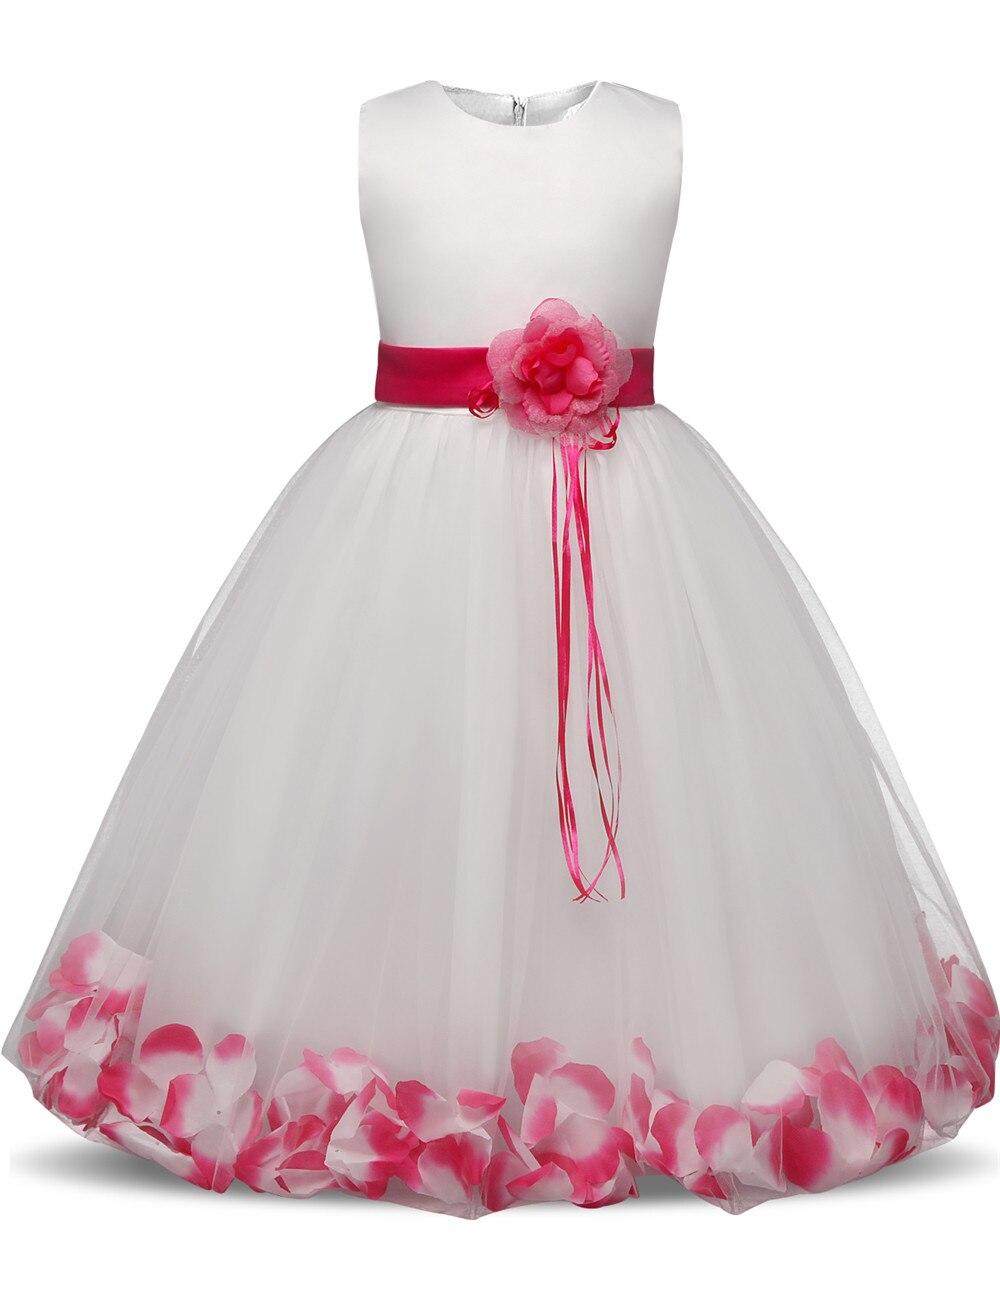 Fancy Flower Children\'s Princess Dresses Girl Kid Ceremony Party ...